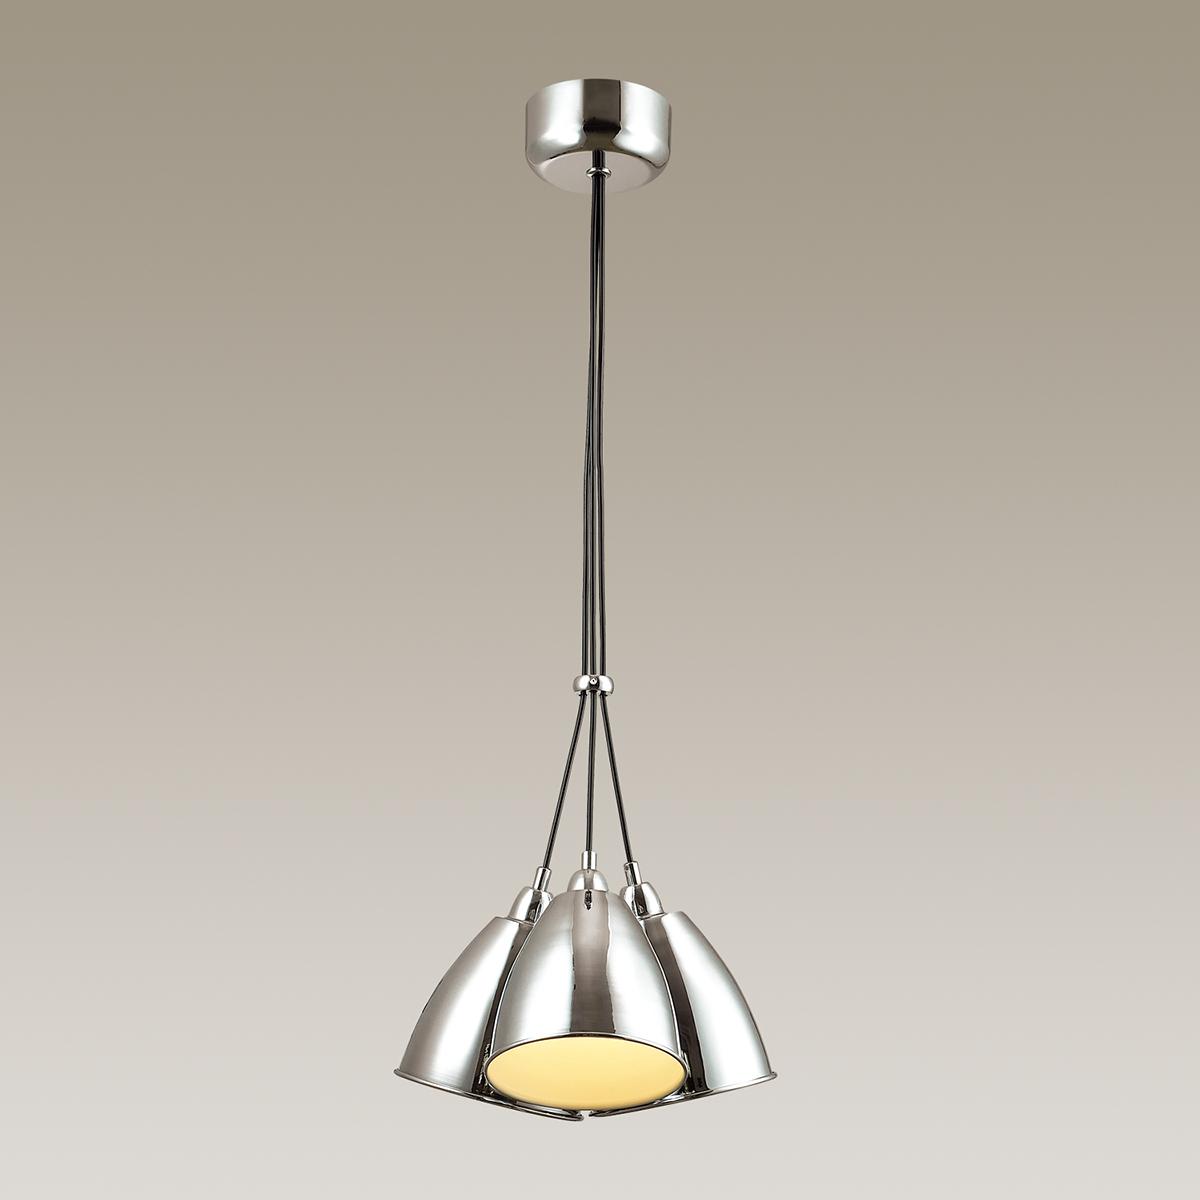 Подвесная люстра Odeon Light Trina 3975/3, 3xE27x60W, хром, металл - фото 1